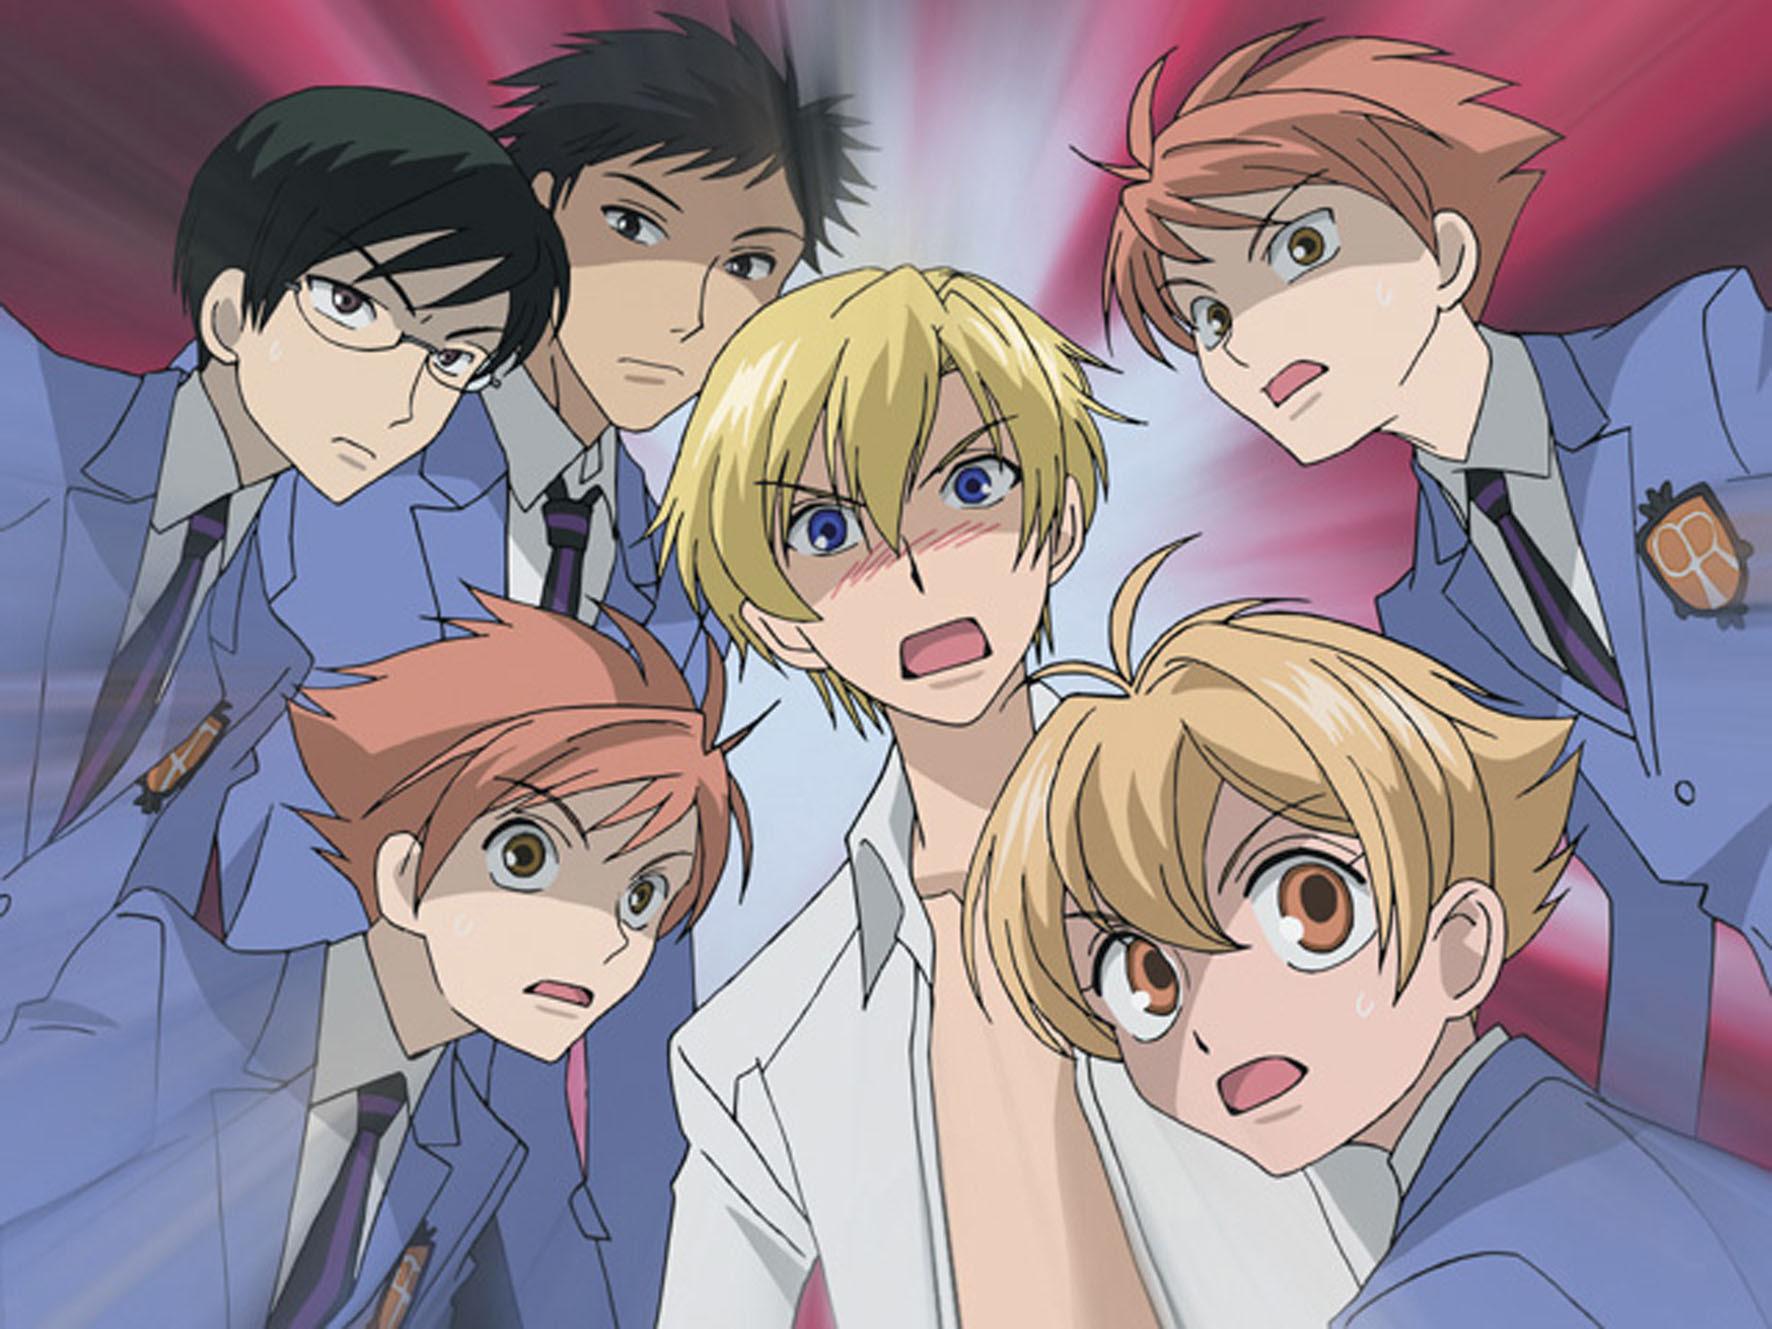 Ouran High School Host Club Volume 1 News Anime Uk Anime And